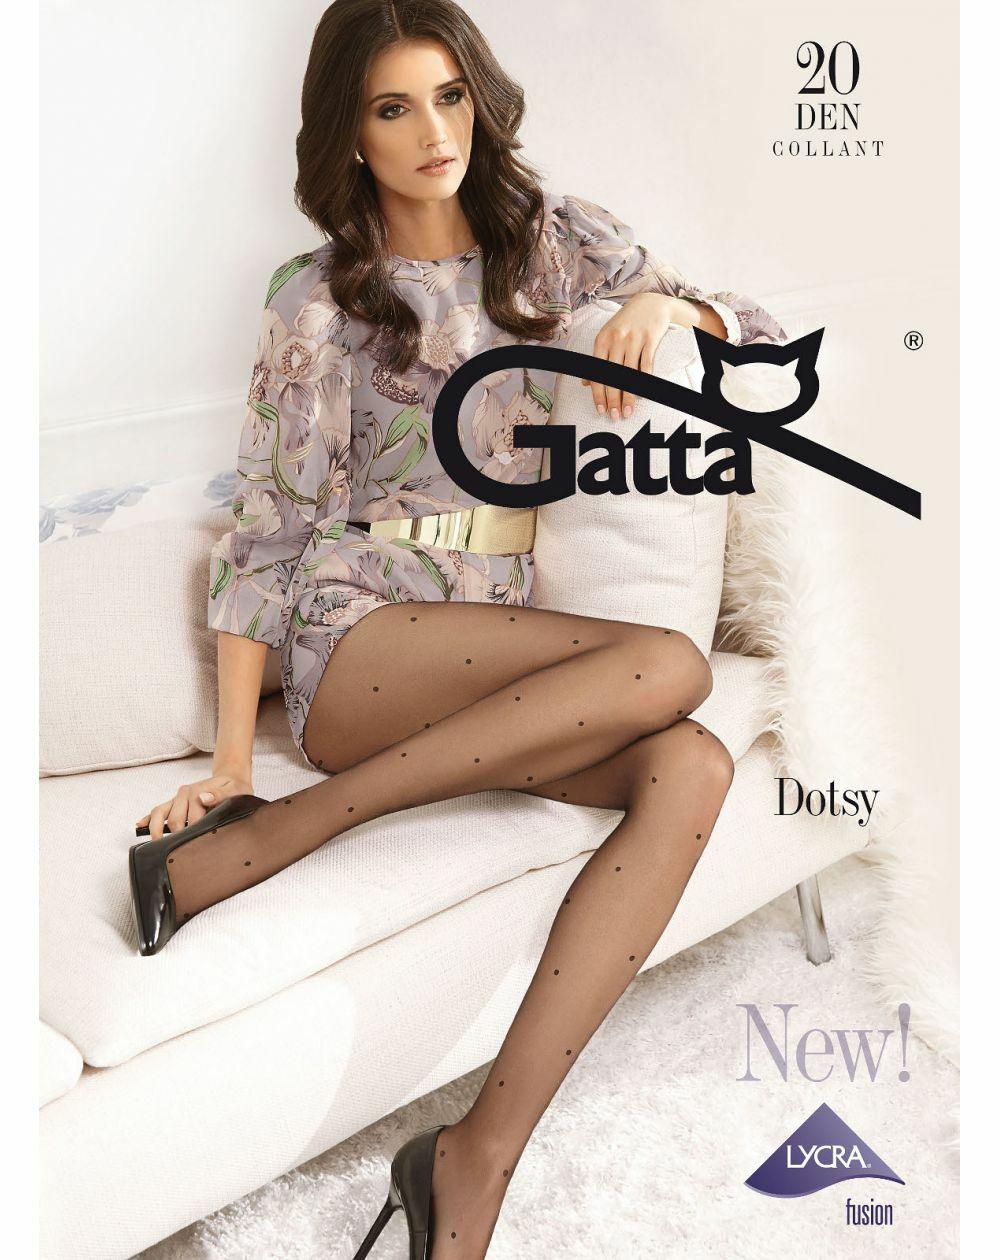 Rajstopy Gatta Dotsy wz.03 20 den 2-4